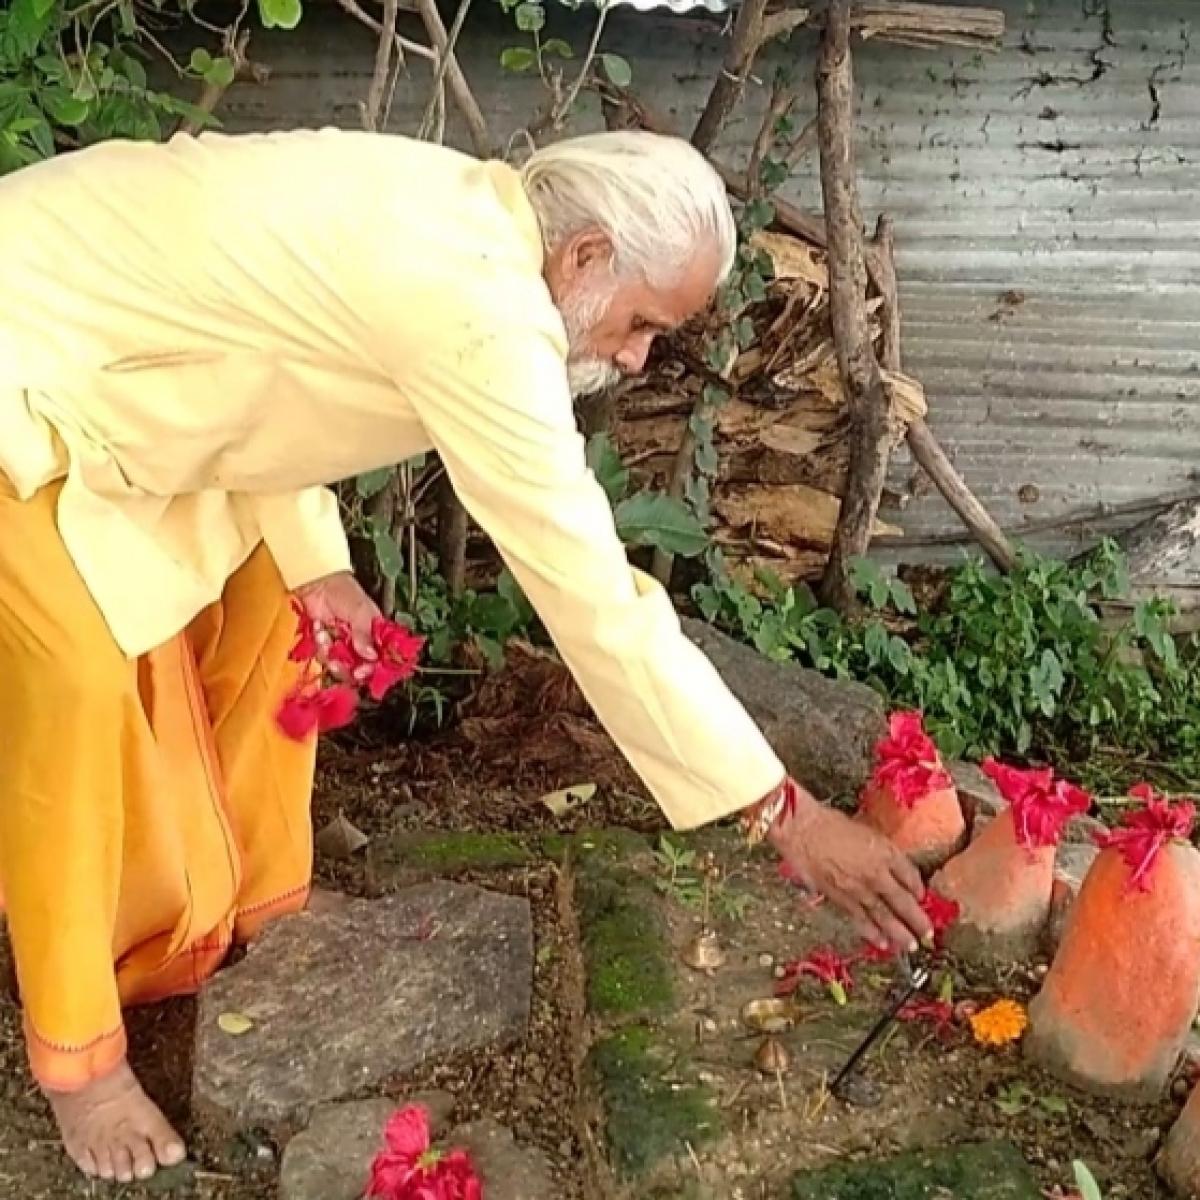 Madhya Pradesh: Since 1977, this man has shunned haircut for Ram Temple